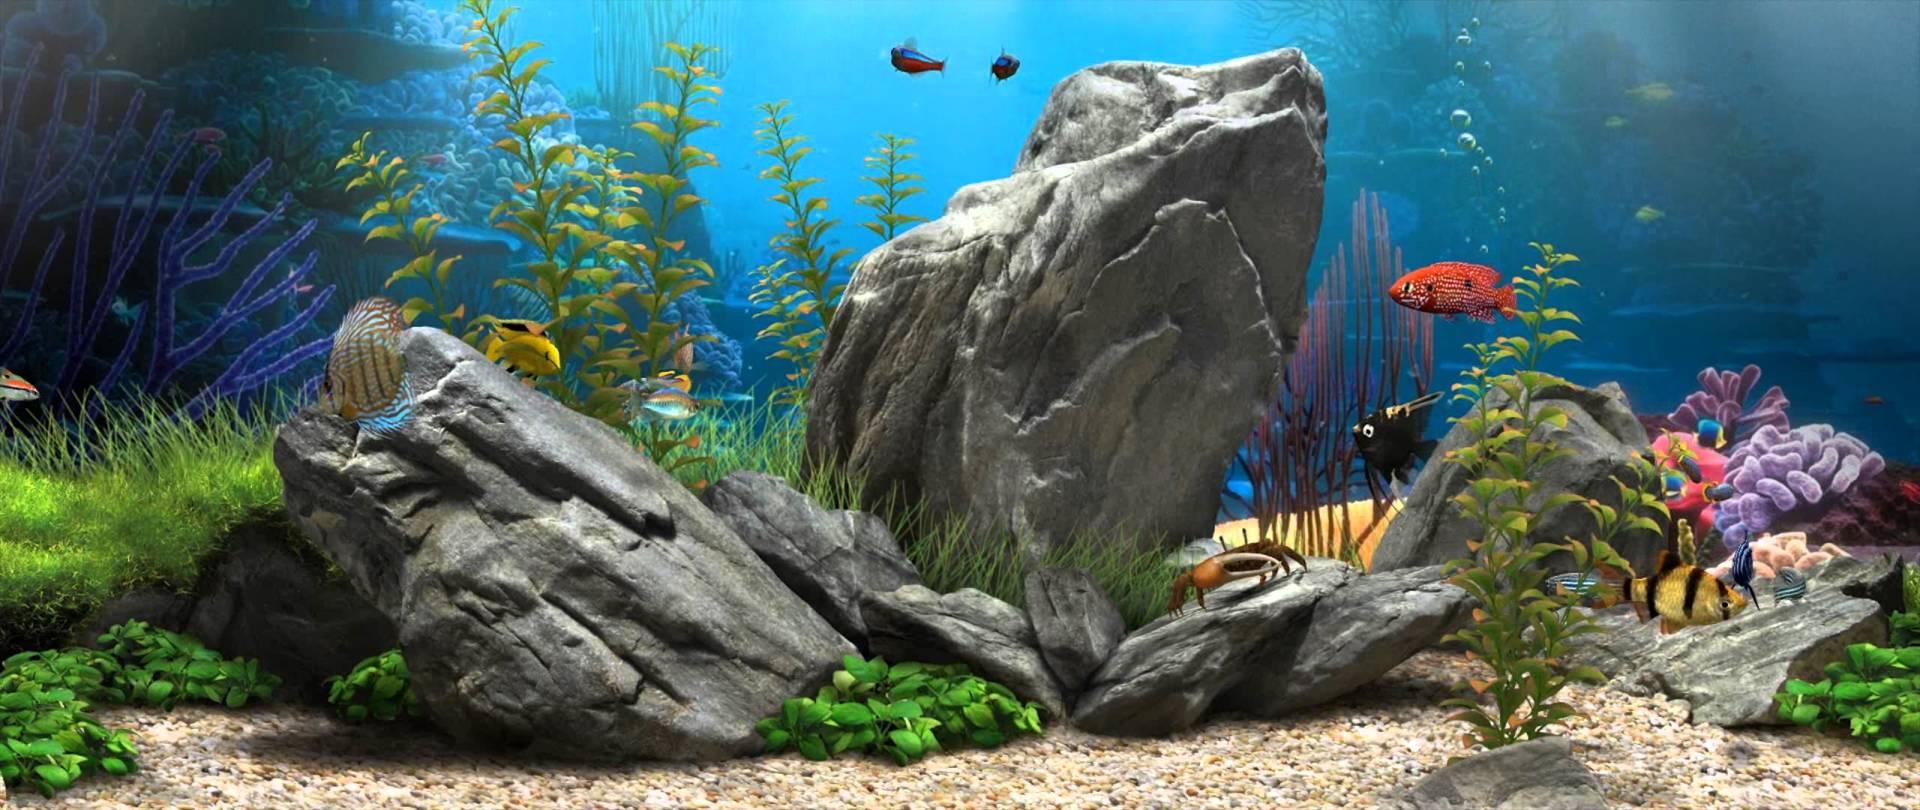 Fish Tank Wallpapers - Top Free Fish